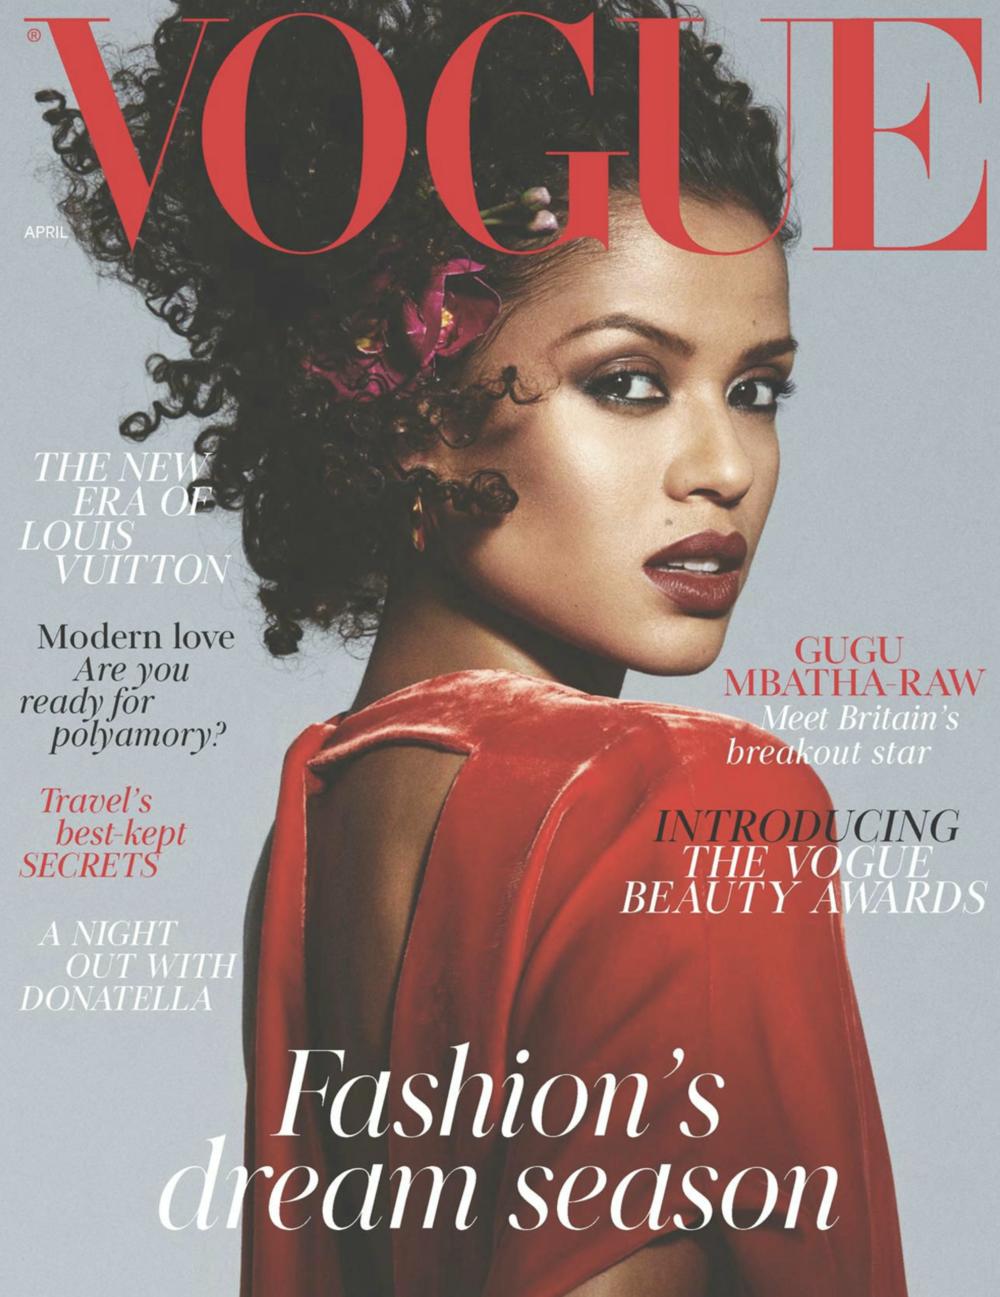 VOGUE April 2018 Cover.png